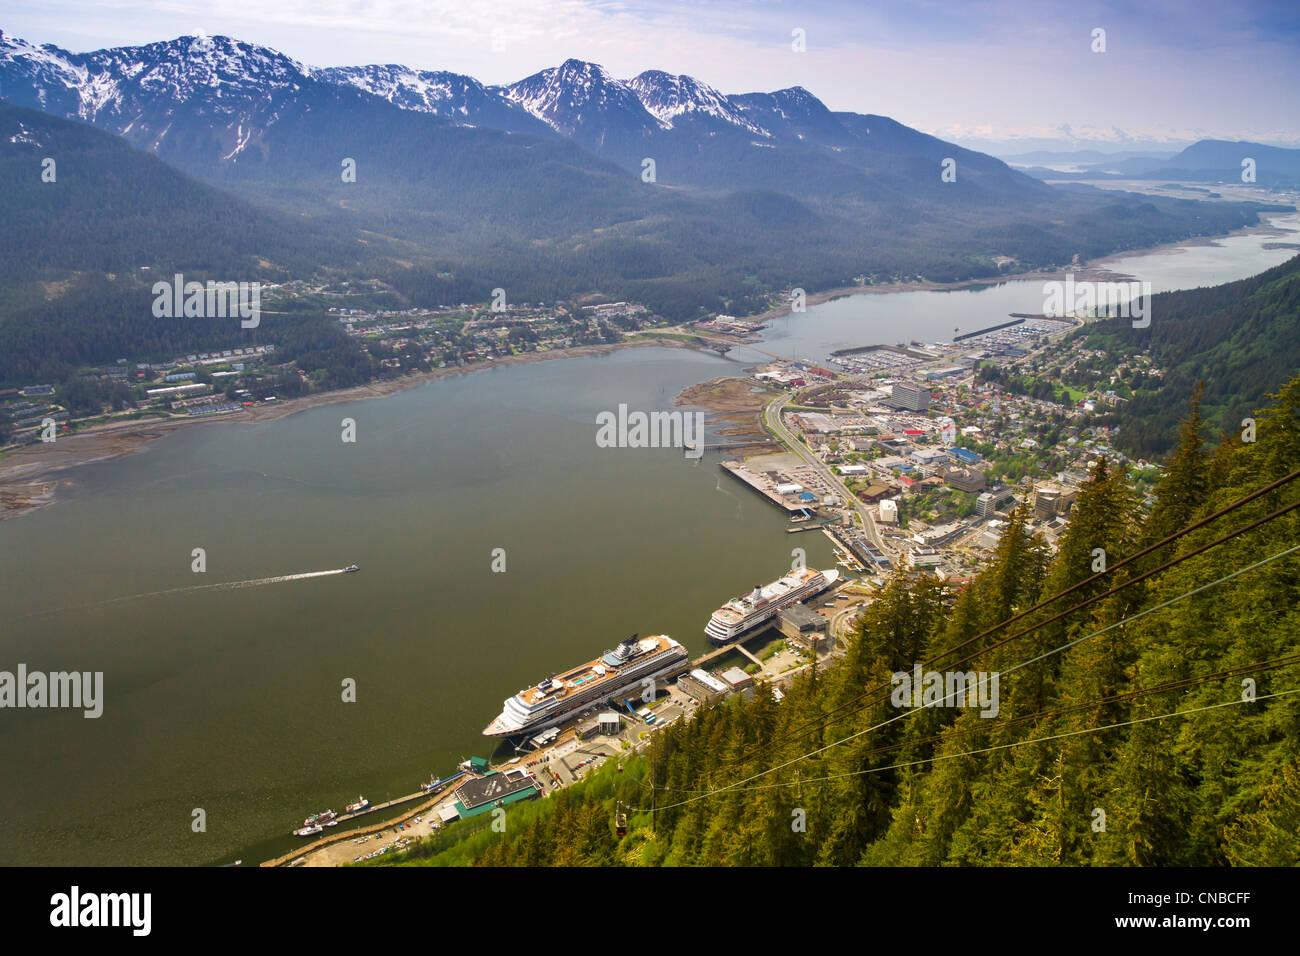 View of downtown Juneau and Douglas Island from Mt. Roberts Tram, Southeast Alaska, Summer - Stock Image